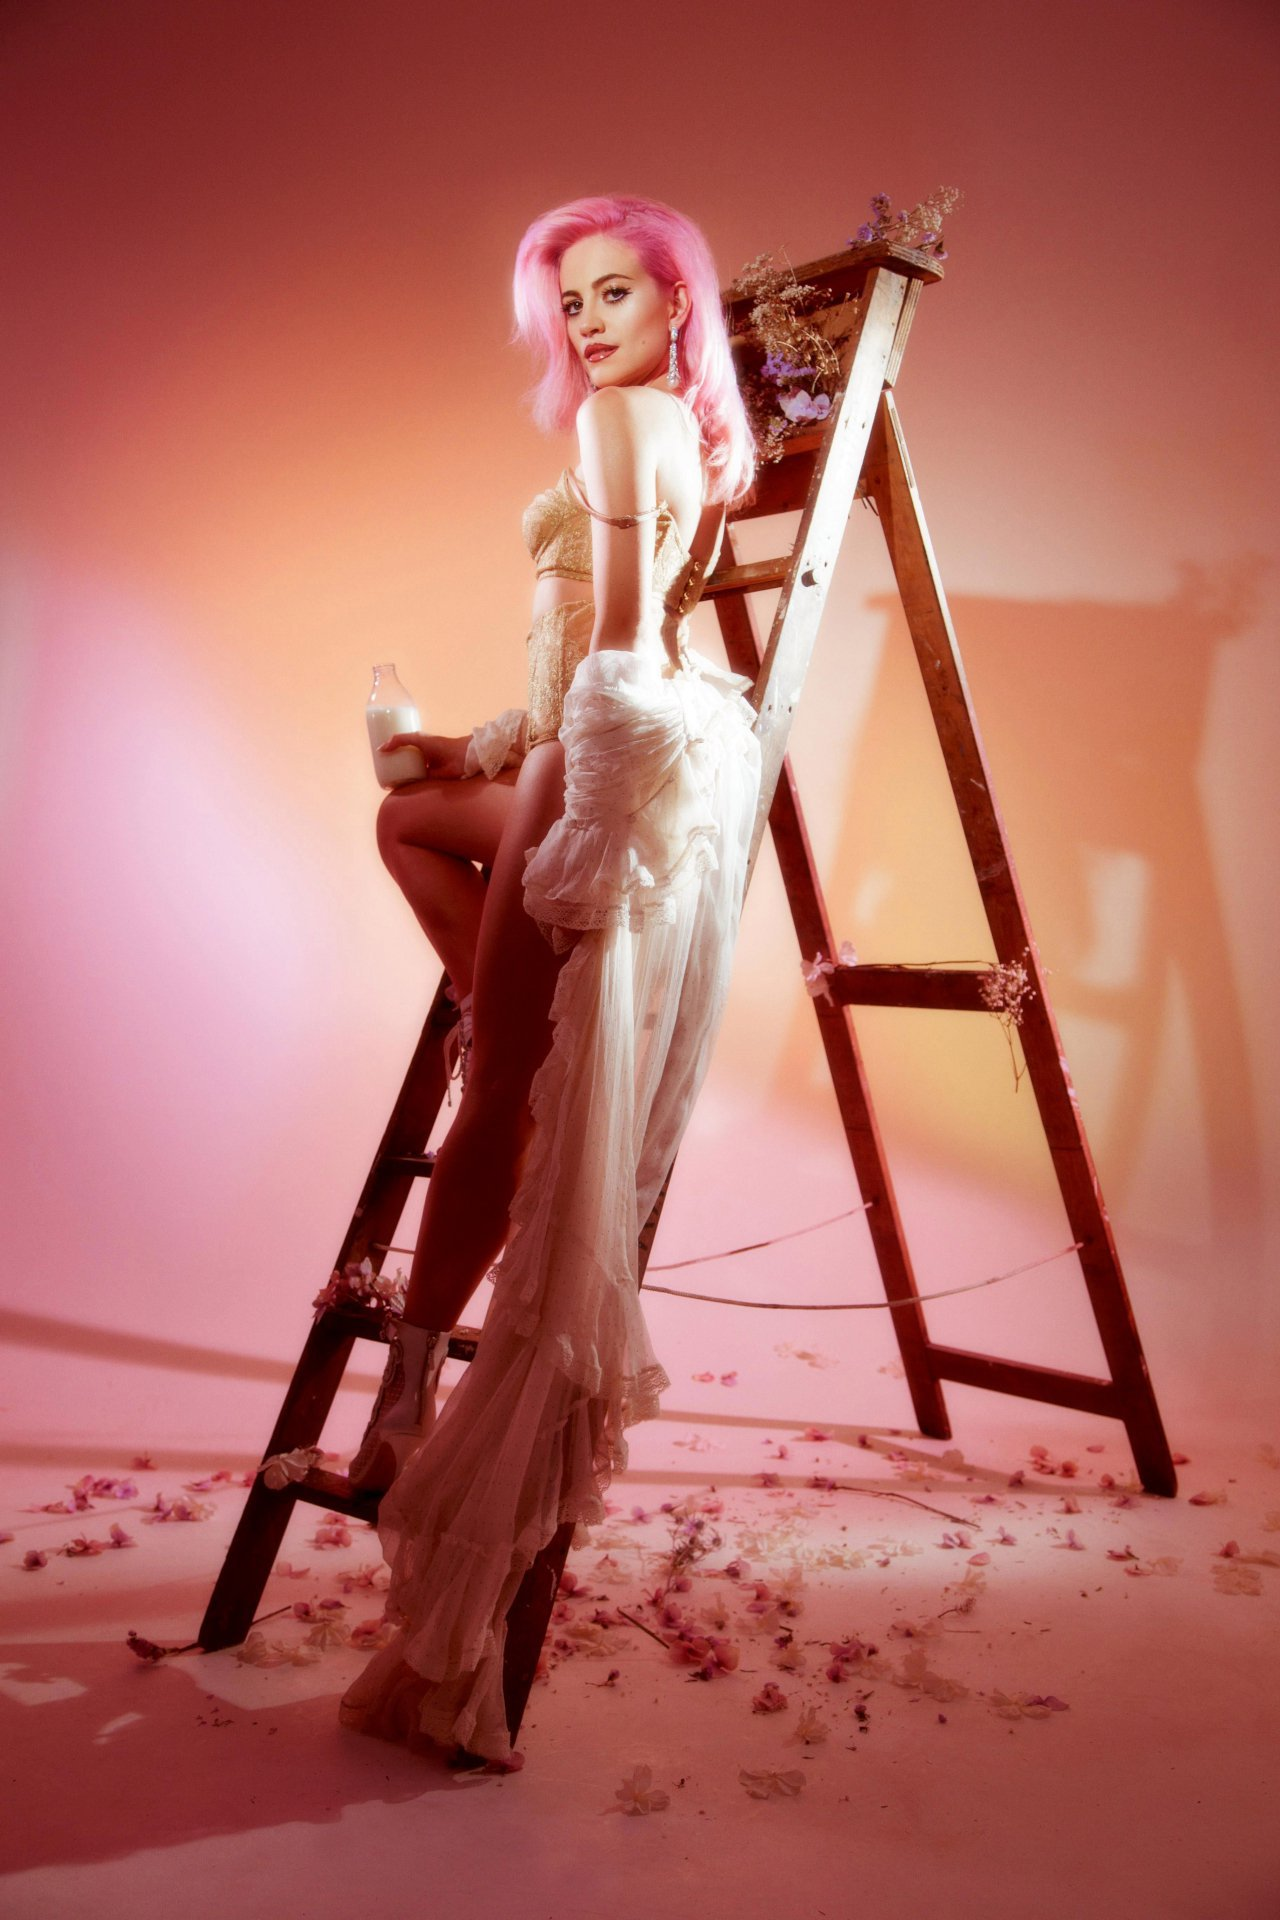 Pixie Lott sexiest photo shoot ever - wonderland